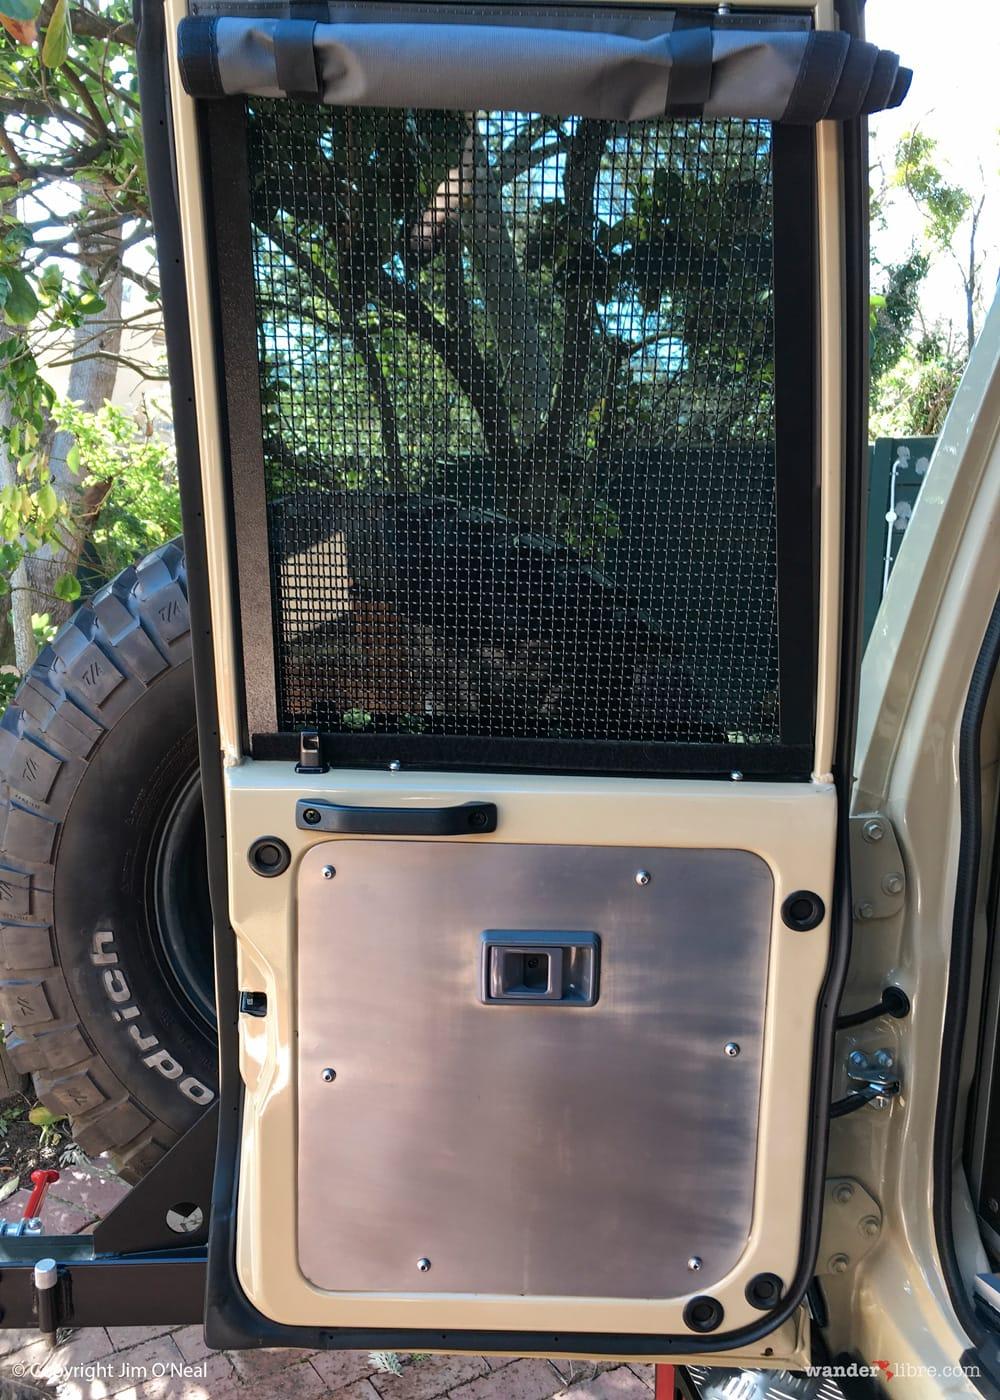 Troopy Cargo Door With SS Door Insert, SS Window Security Screen & Privacy Curtain